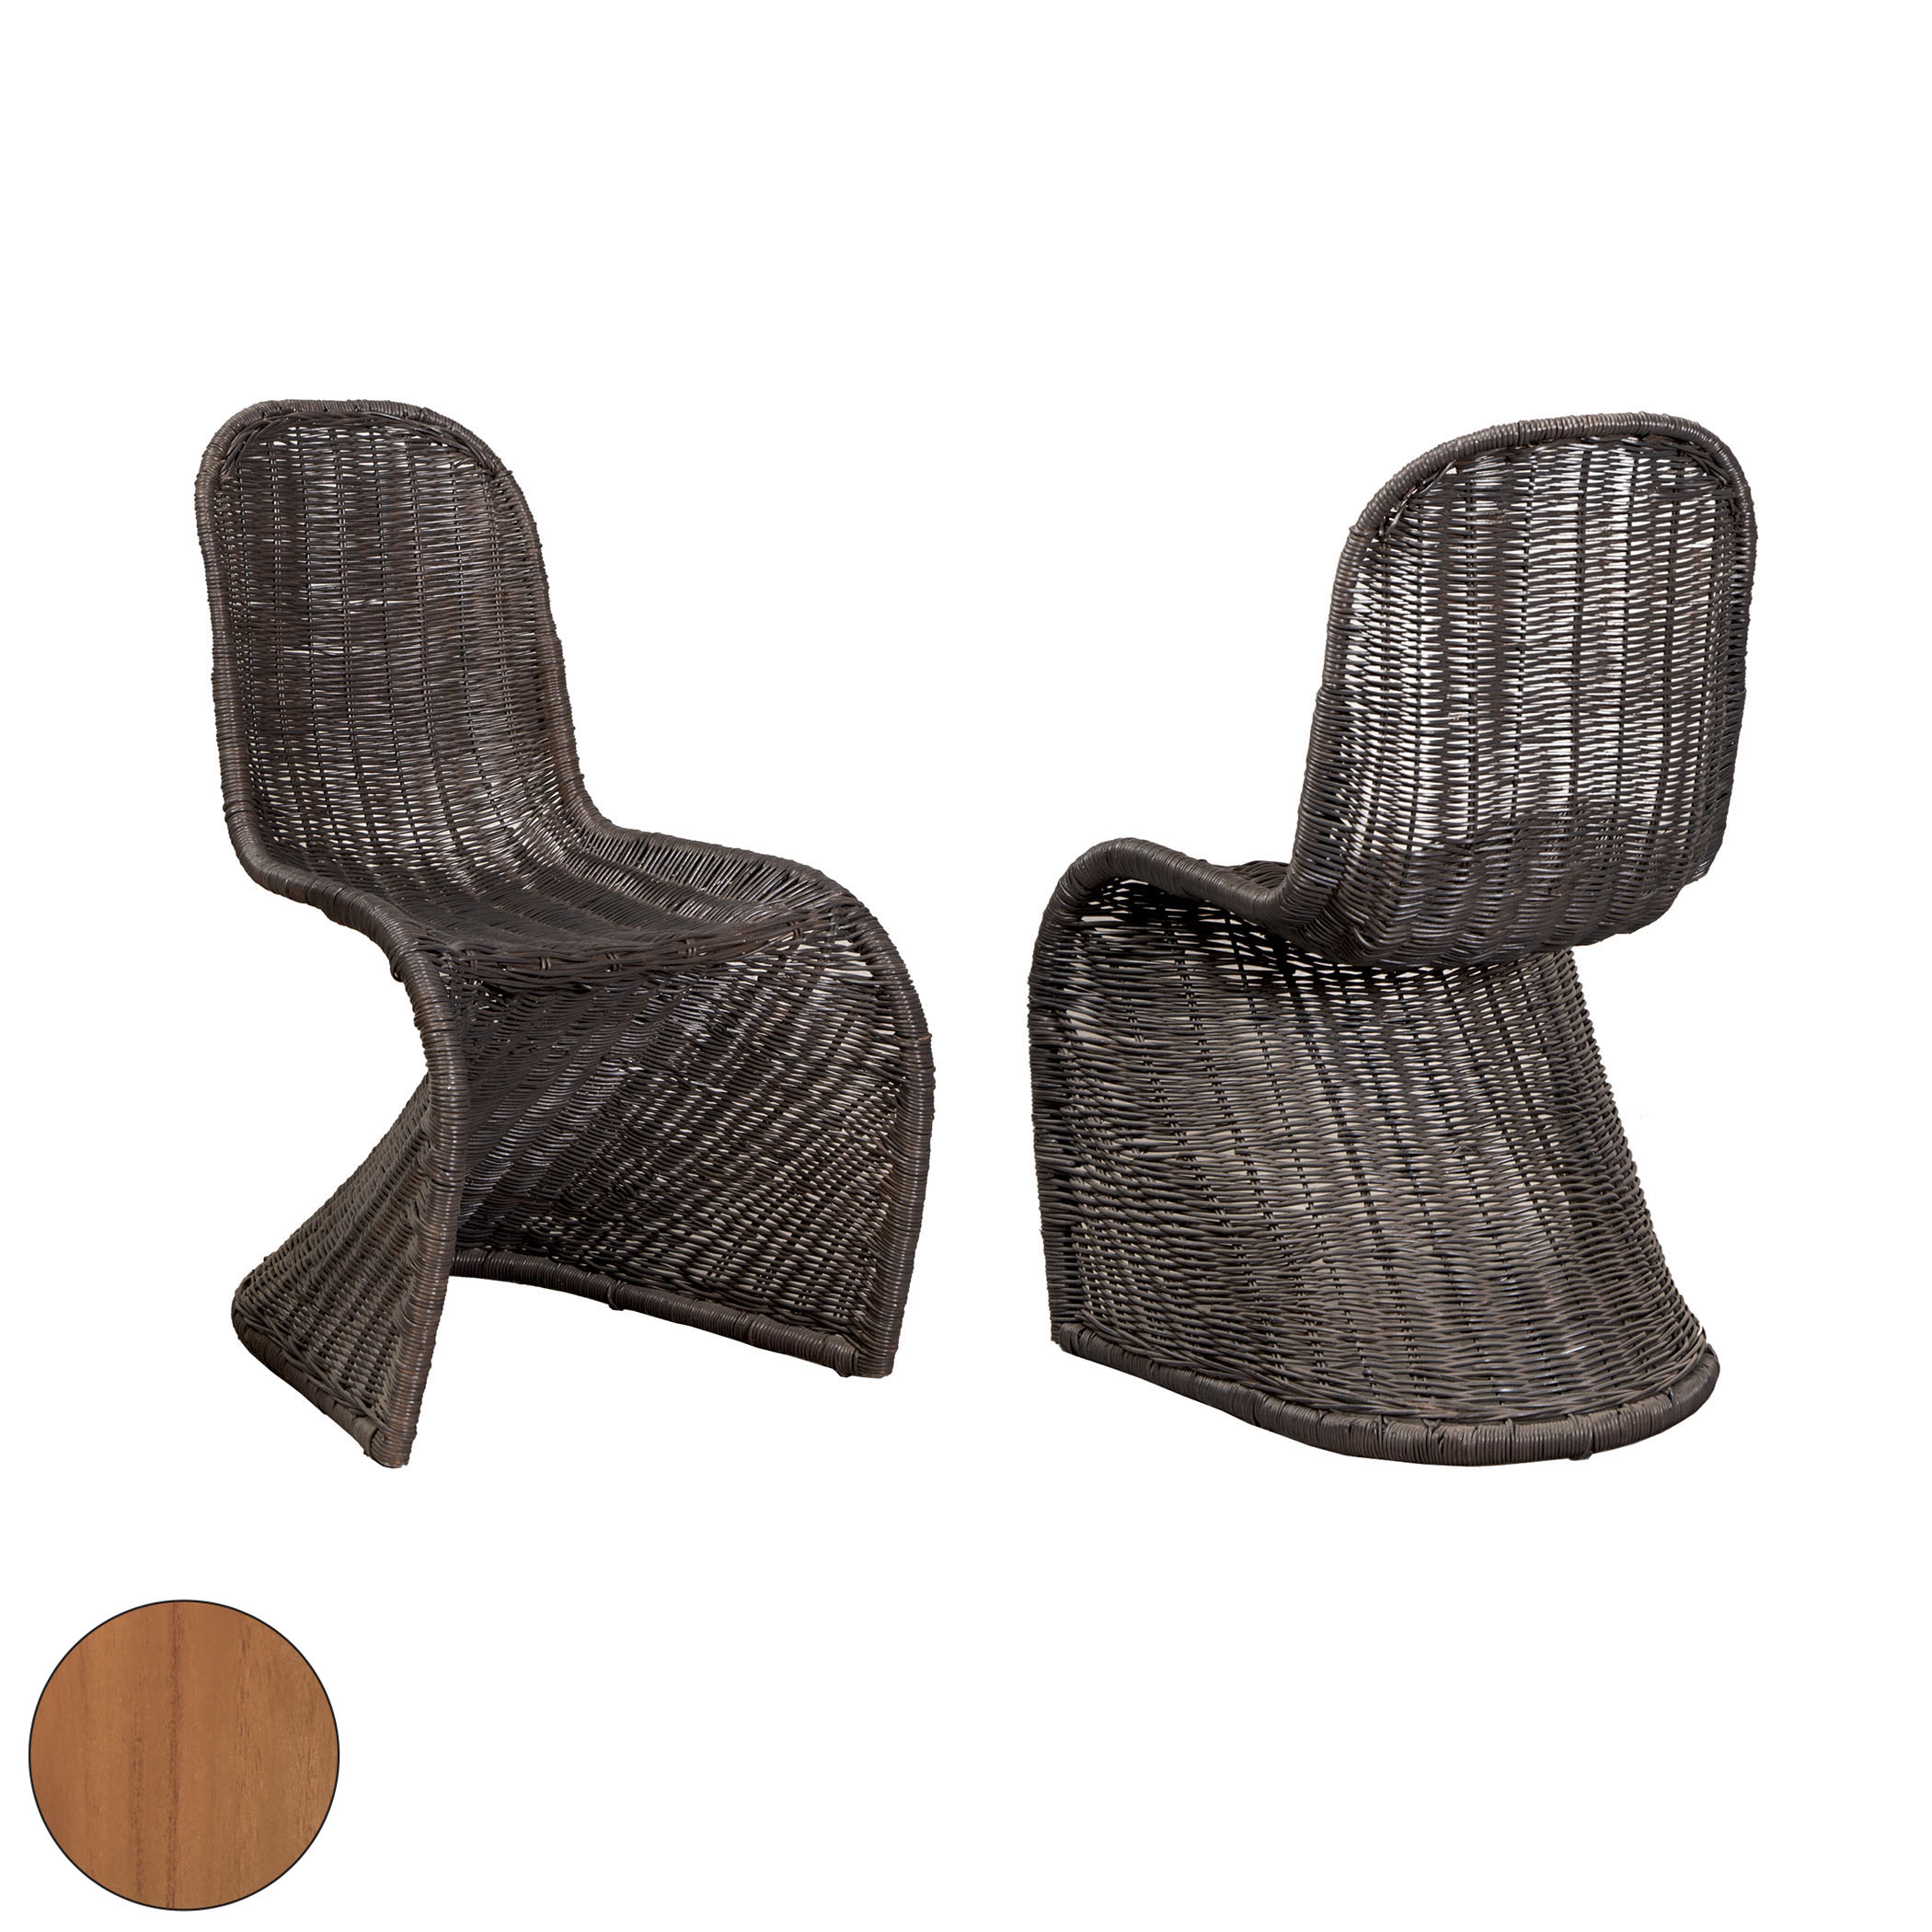 Rattan Dining Chair Set of 2 6917509P-ET | ELK Home